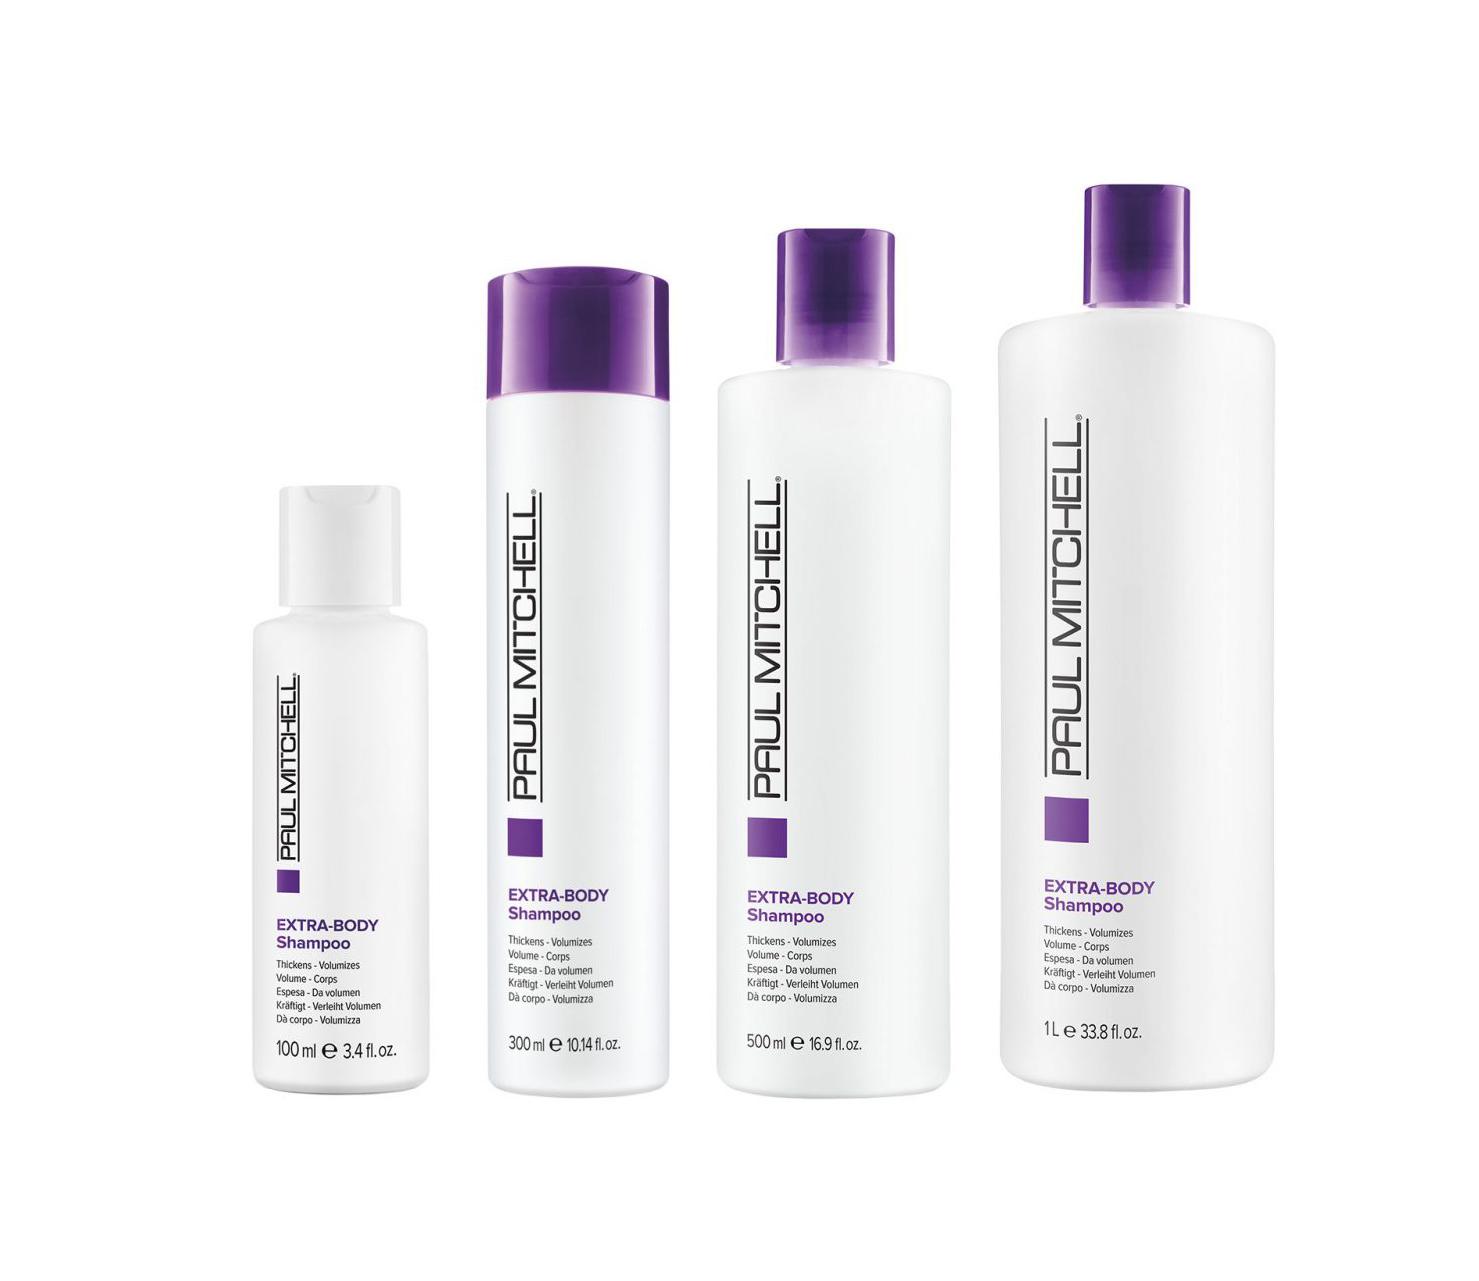 Paul Mitchell Extra-Body Shampoo - šampon pro objem vlasů